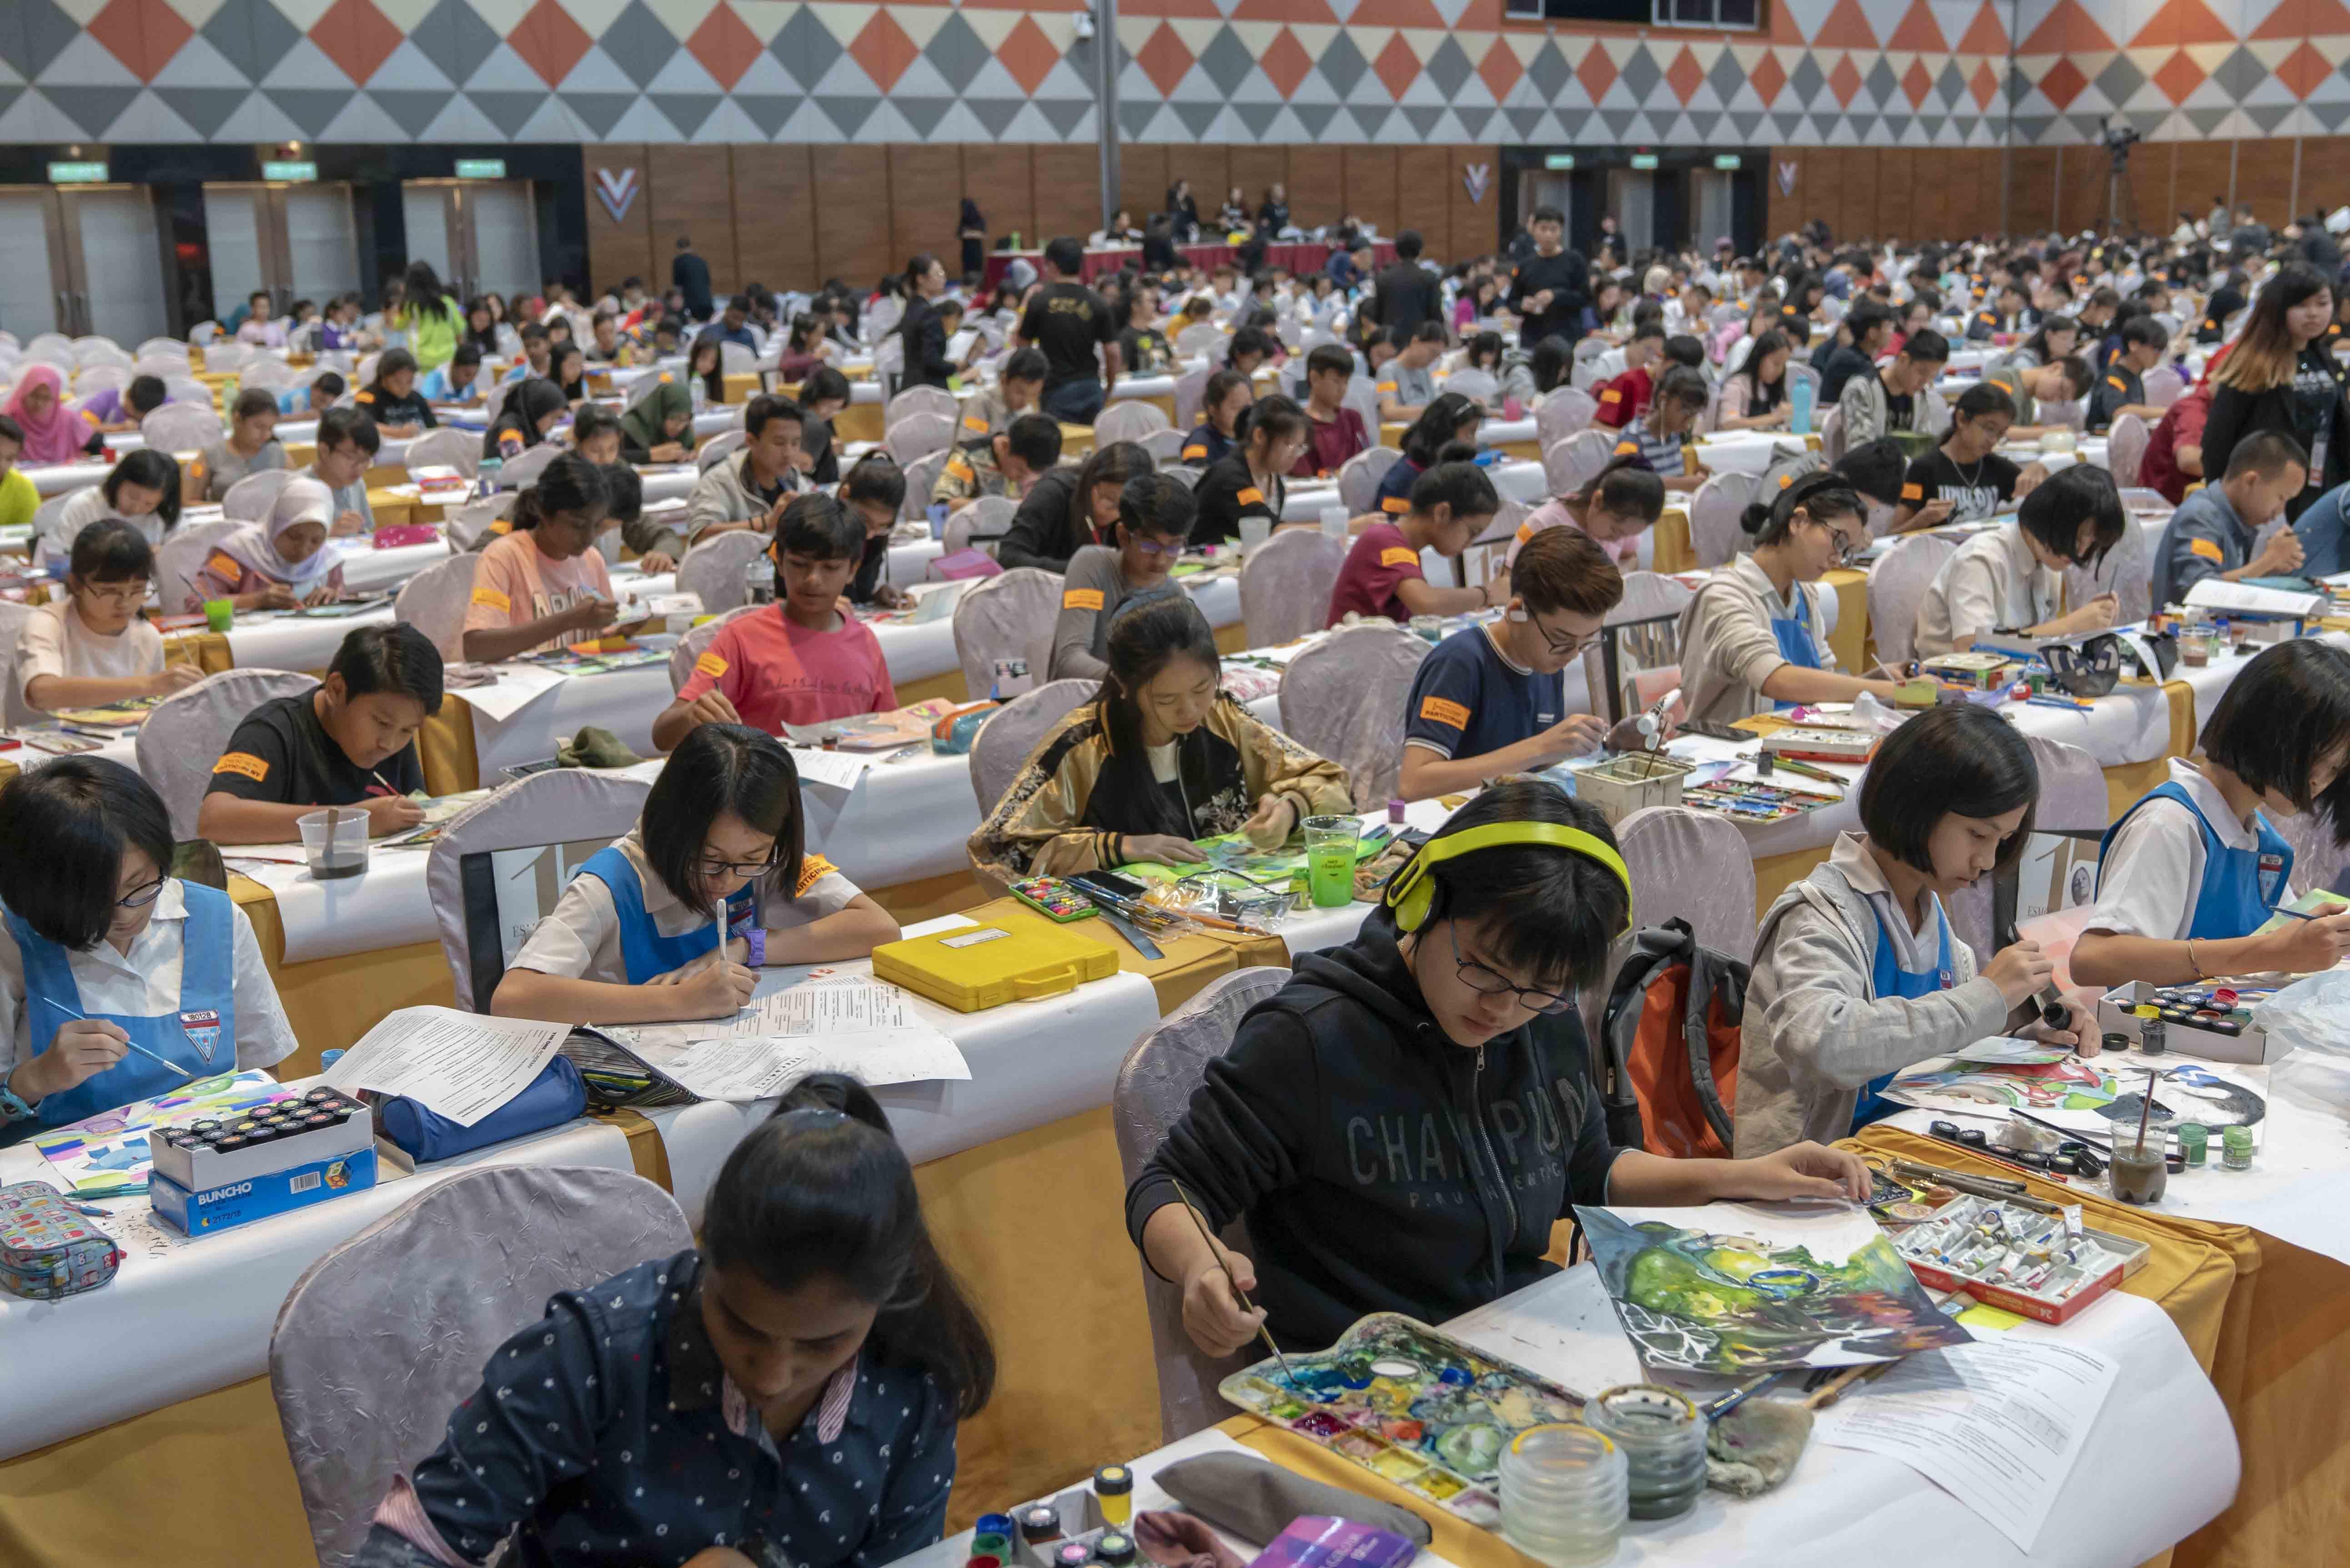 Contestants hard at work preparing their art pieces